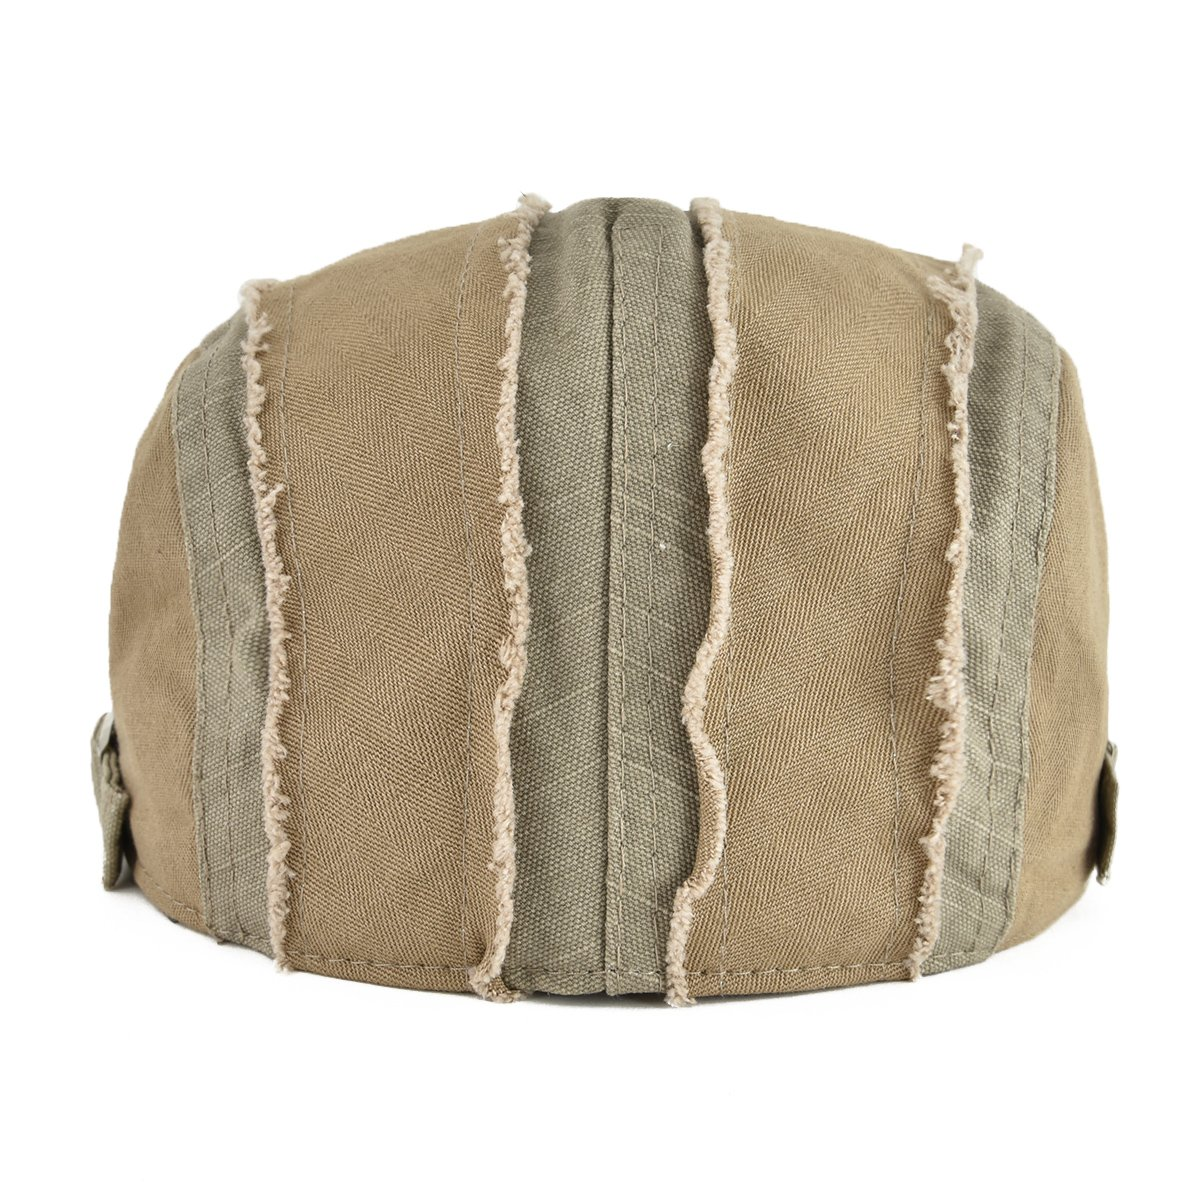 VOBOOM 100/% Cotton Distressed Ivy Caps Newsboy Caps Cabbie Hat Gatsby Hat